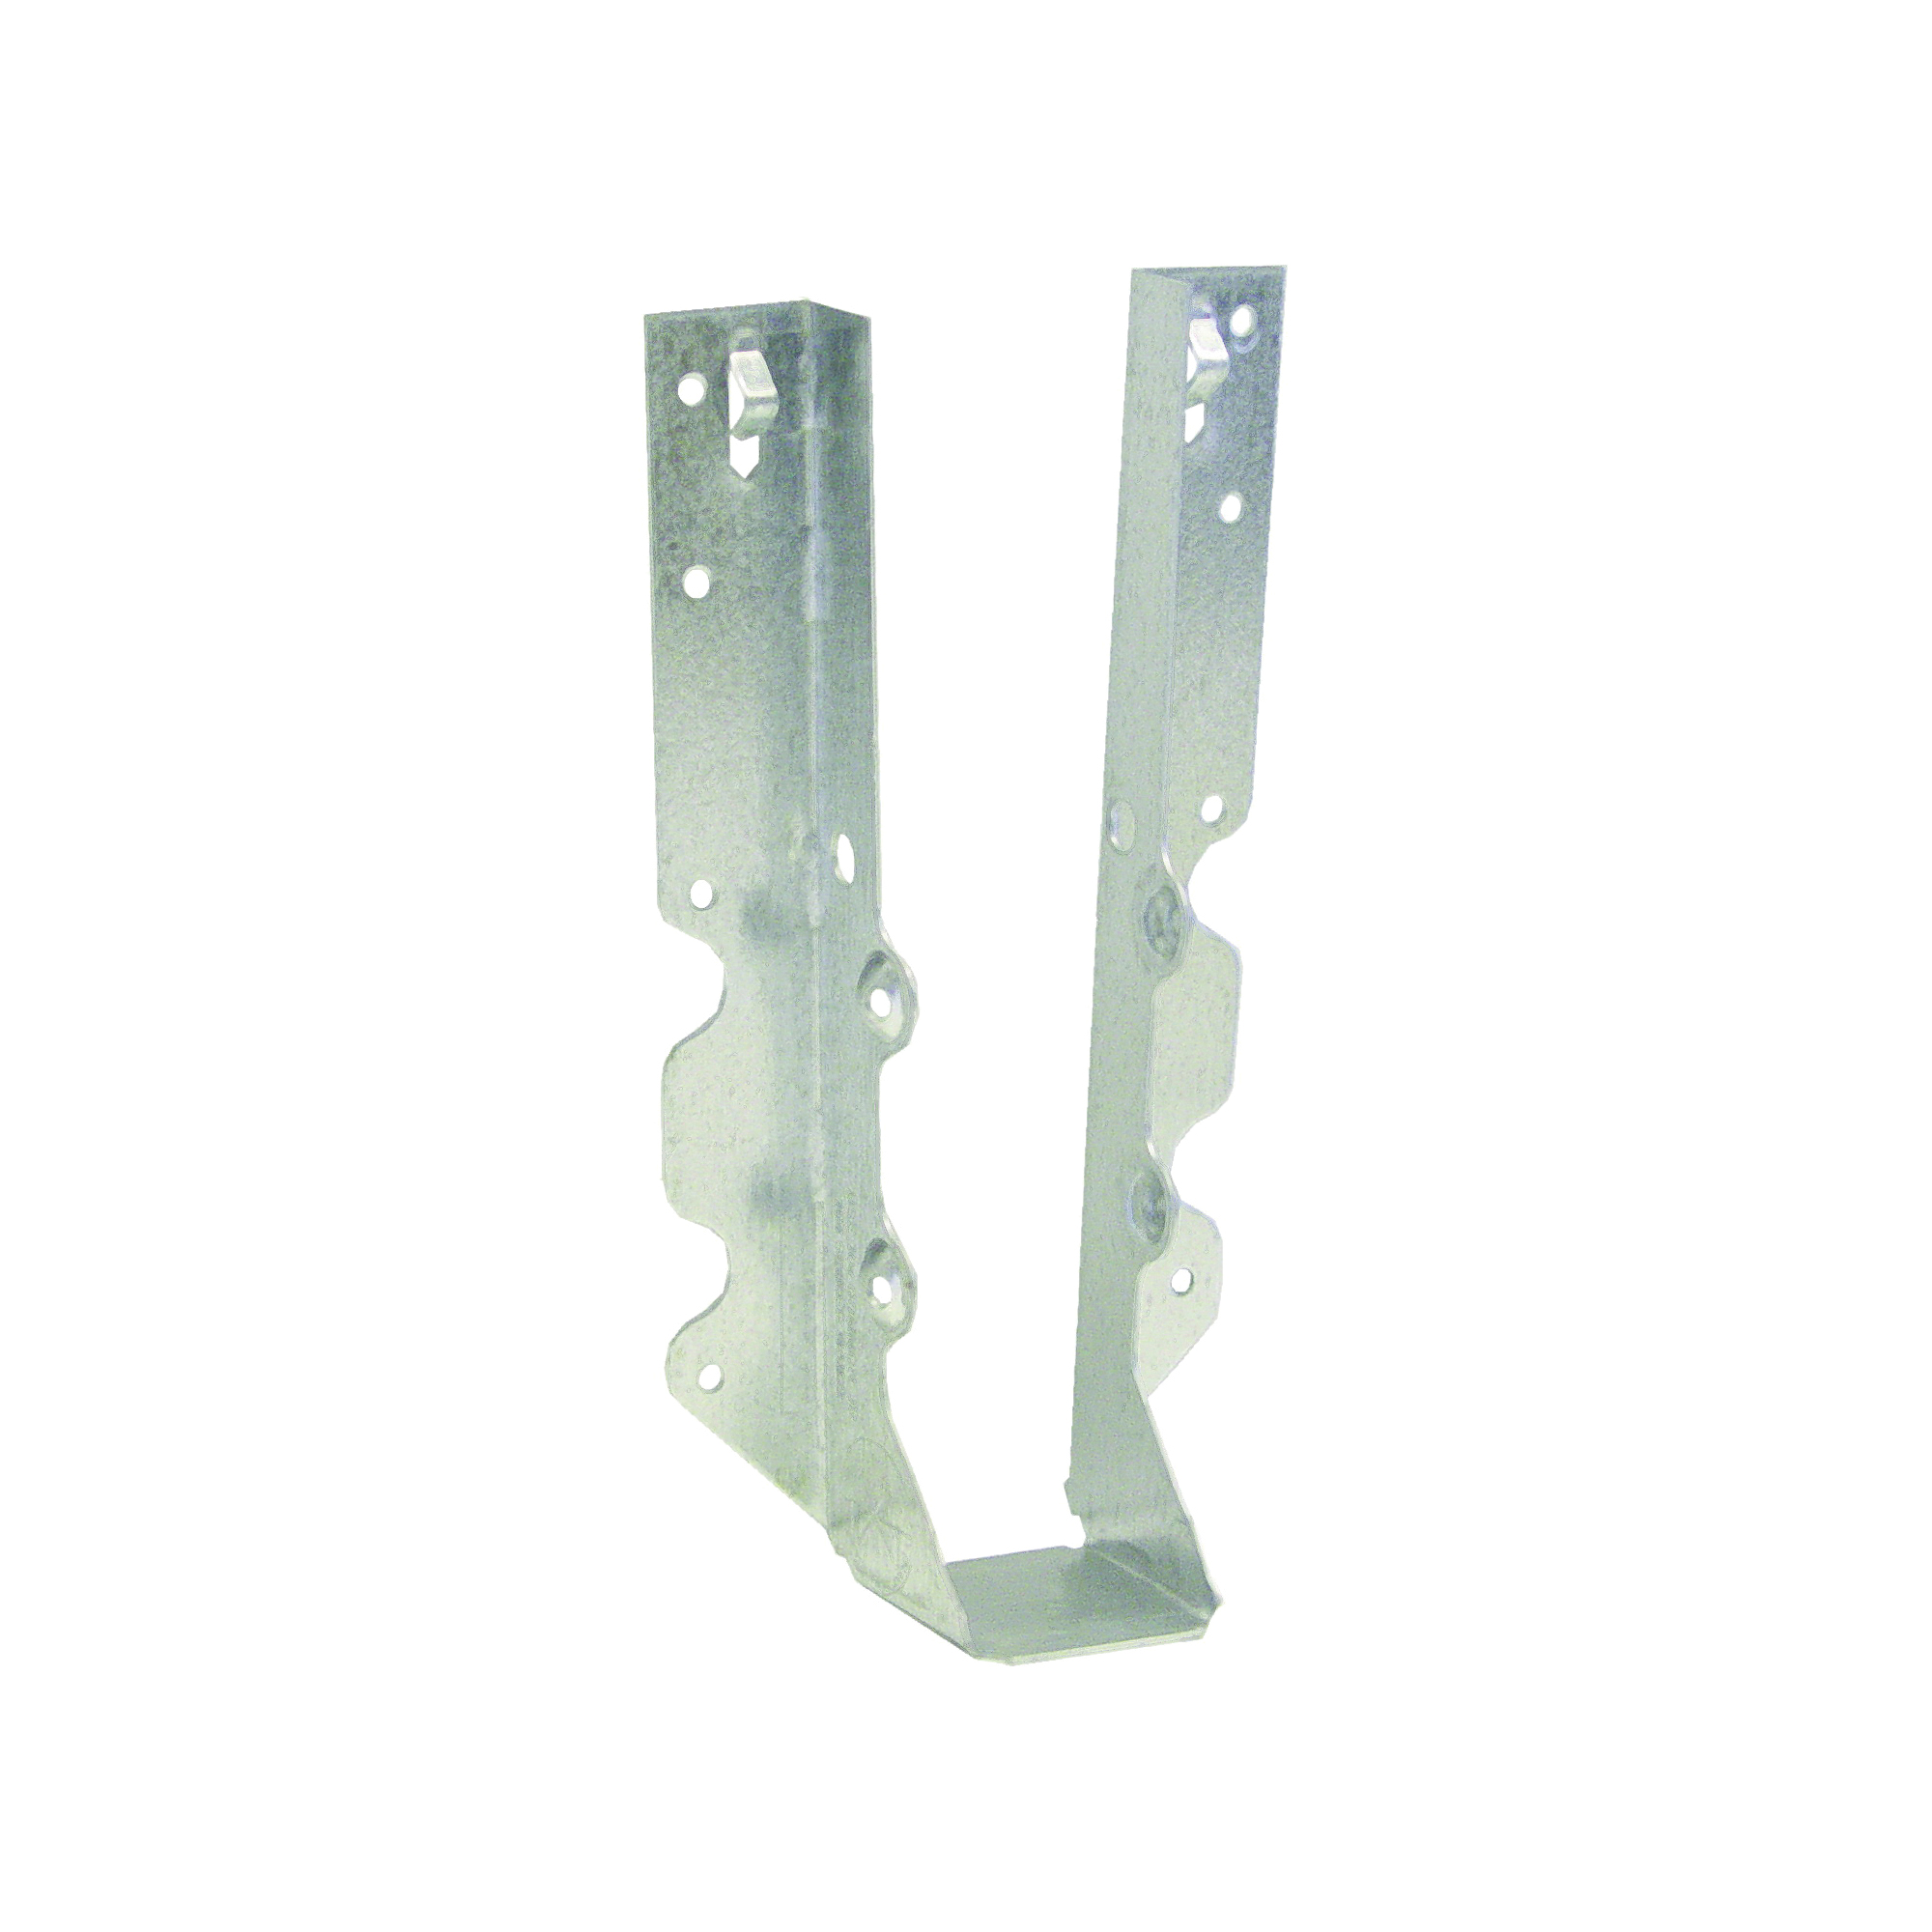 Picture of MiTek JUS210 Slant Joist Hanger, 7-3/4 in H, 1-3/4 in D, 1-9/16 in W, 2 in x 10 to 12 in, Steel, G90 Galvanized